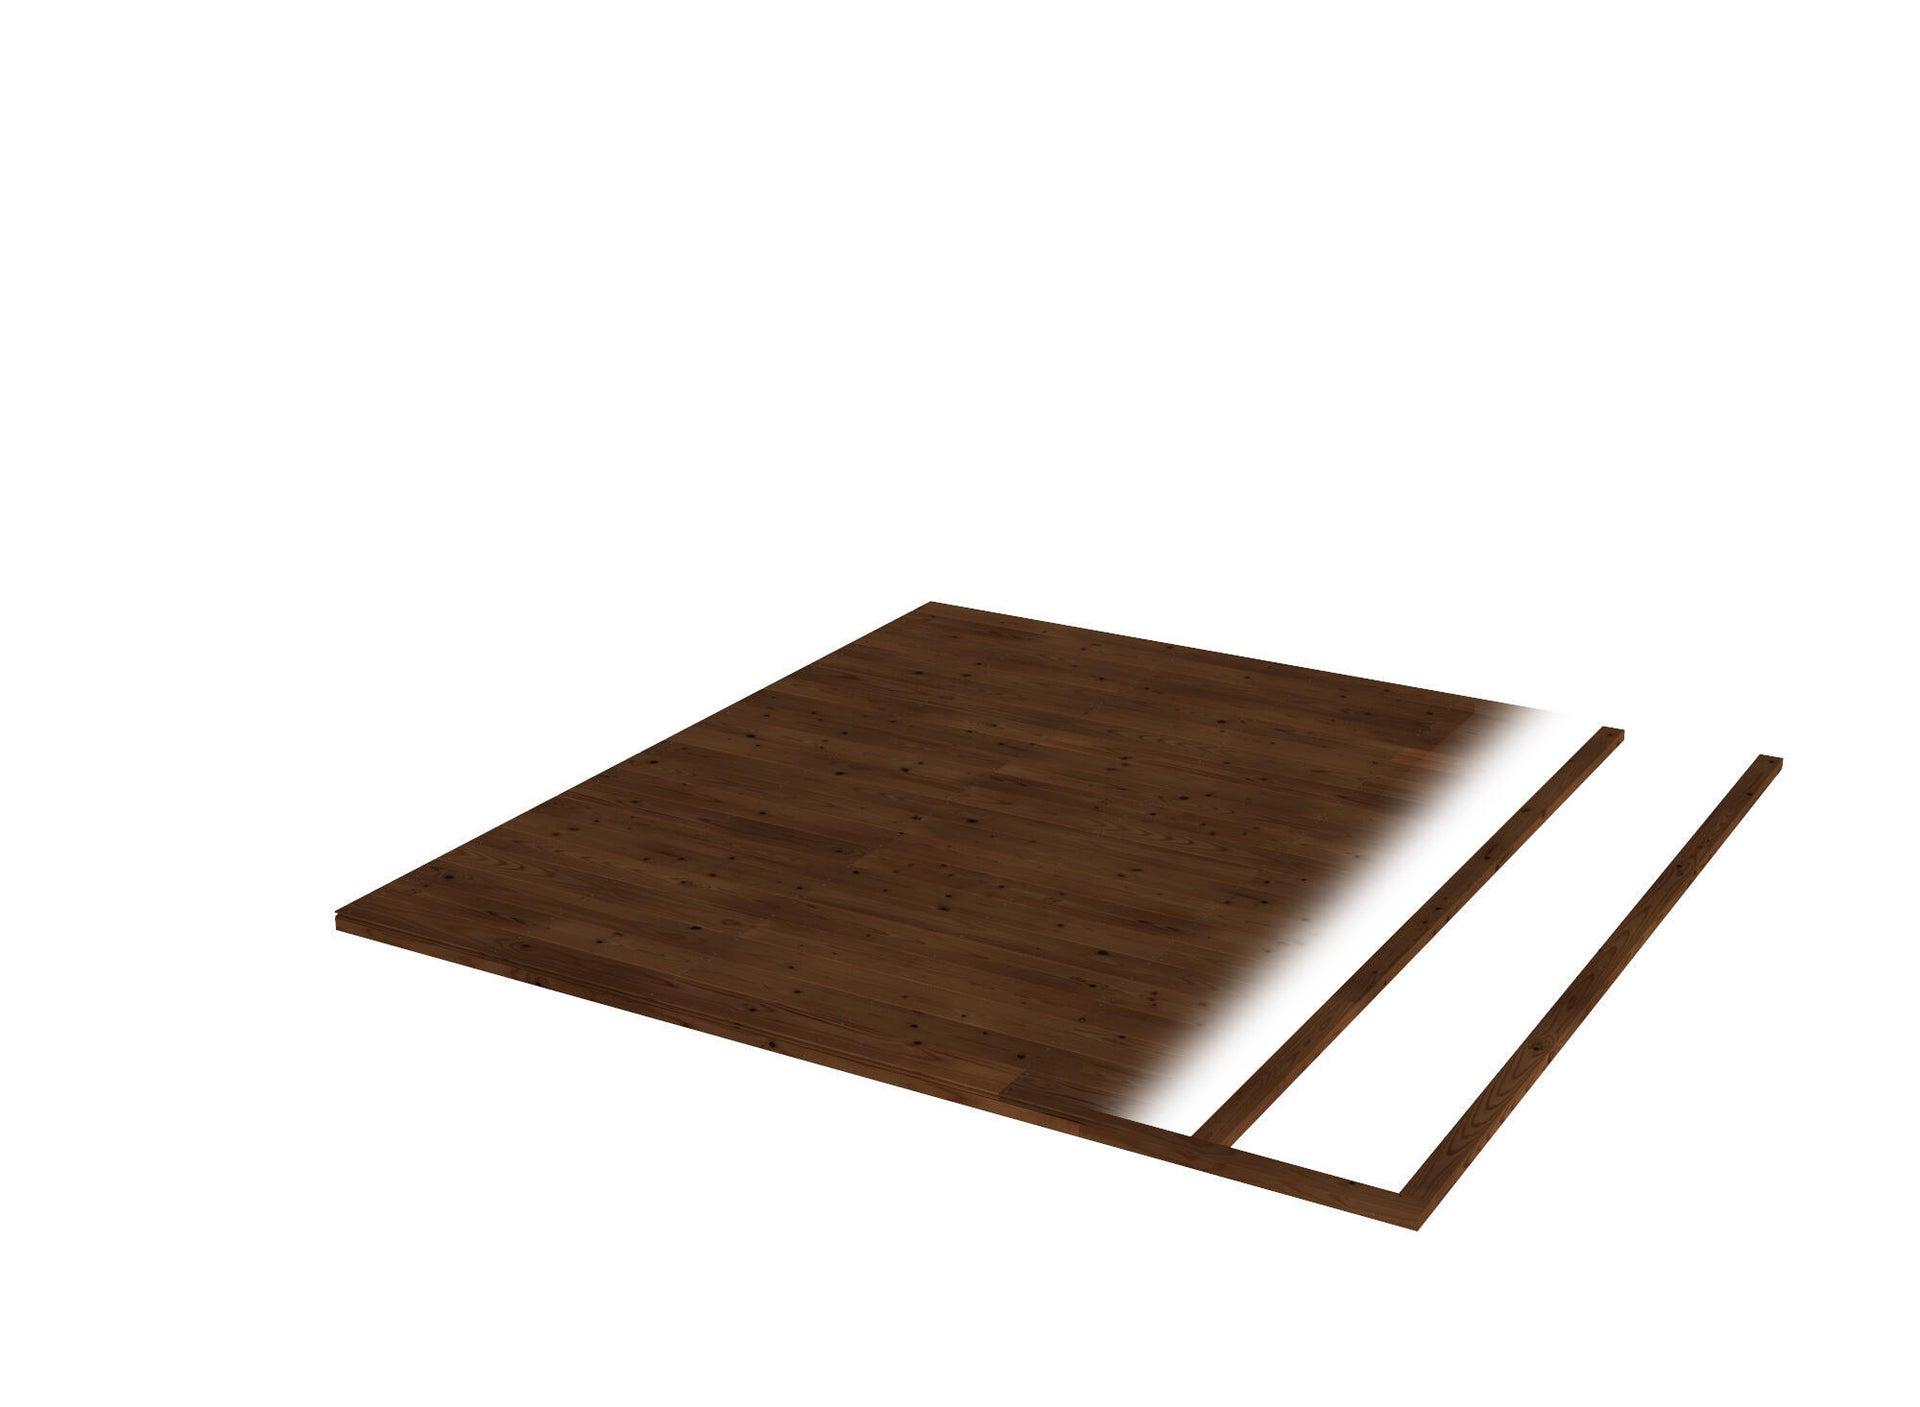 Pavimento per casetta da giardino Viola DECOR ET JARDIN 241.4 x 250 x 45 cm - 3